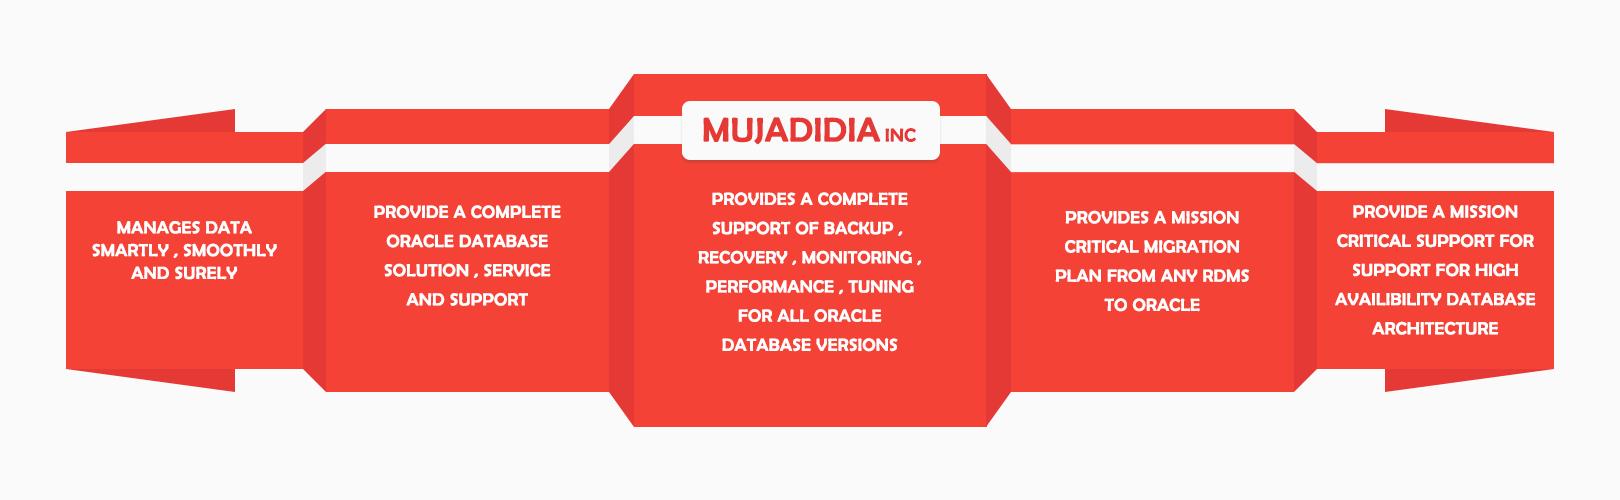 DB Management Services – Mujadidia Inc